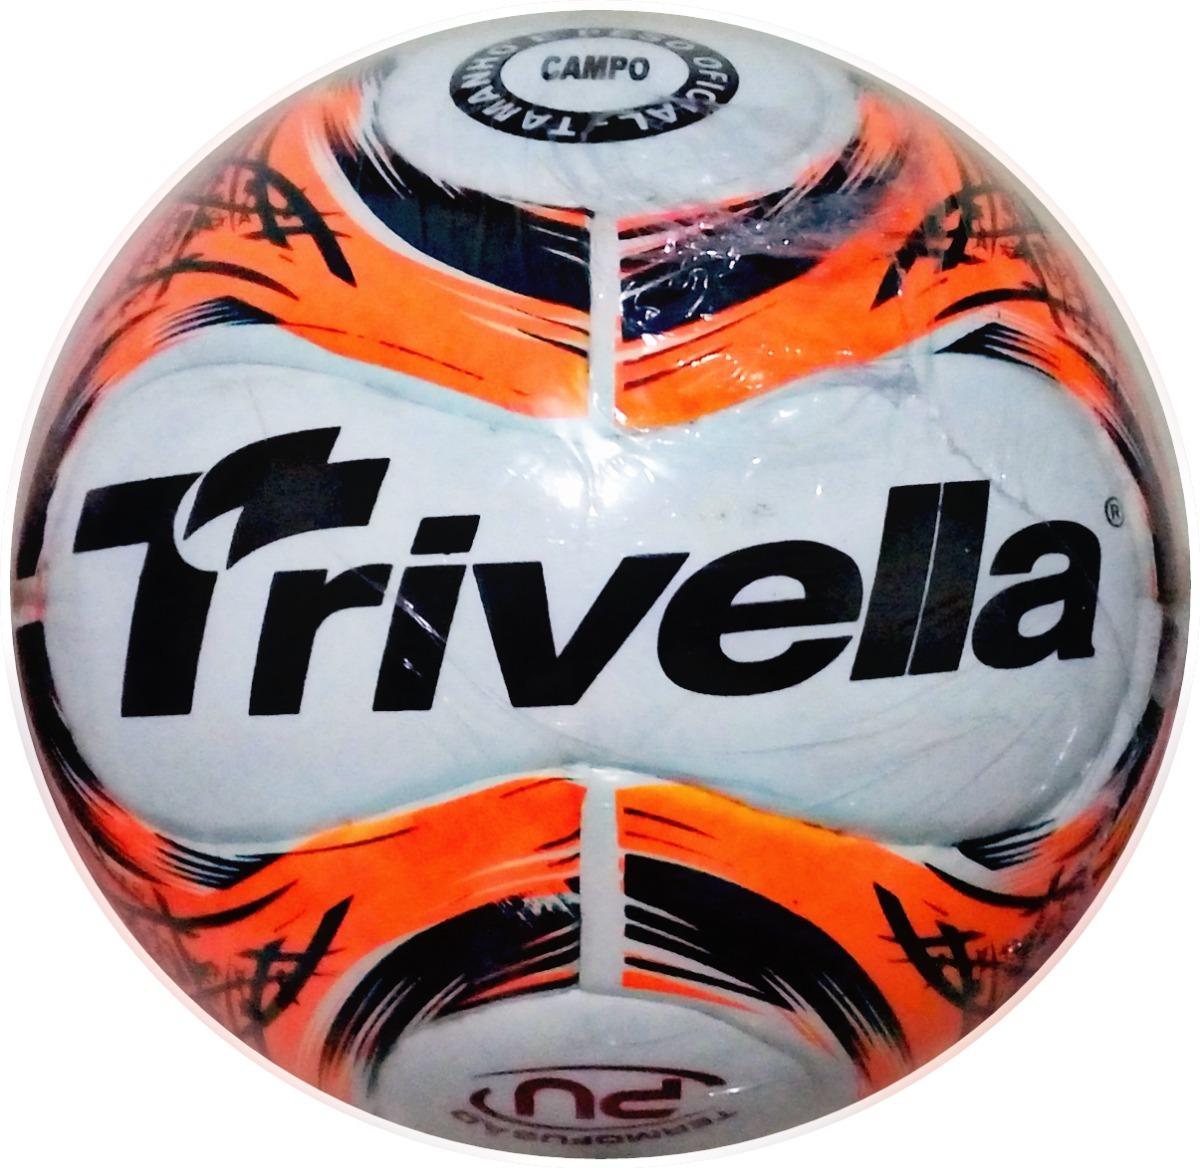 a79dd89434 bola futebol campo futsal society trivella - brasil gold. Carregando zoom.